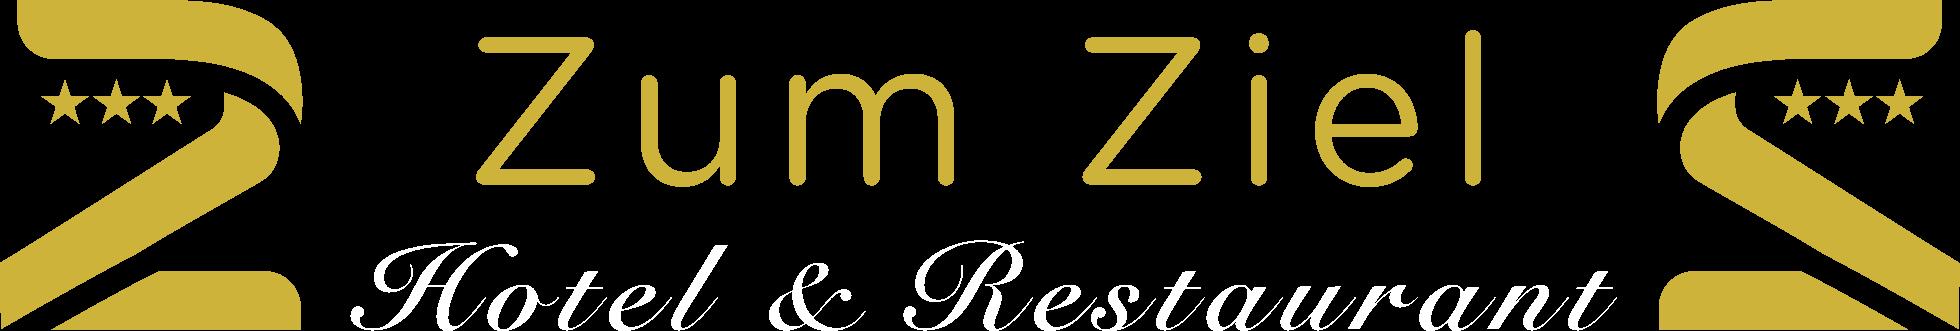 Hotel & Gastronomie zum Ziel